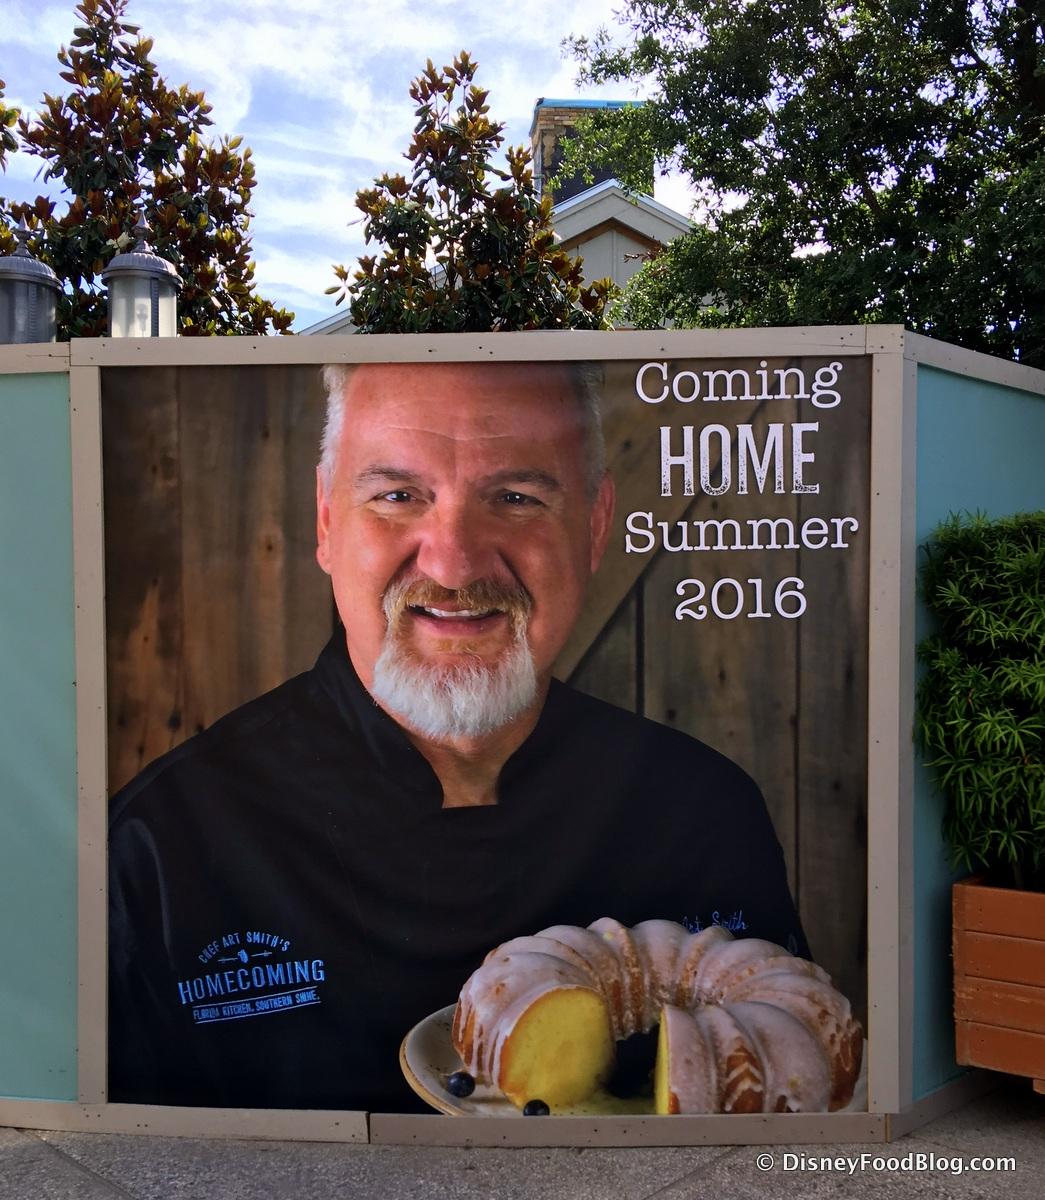 Kitchen Art South Florida: Menu Sneak Peek For Homecoming: Florida Kitchen And